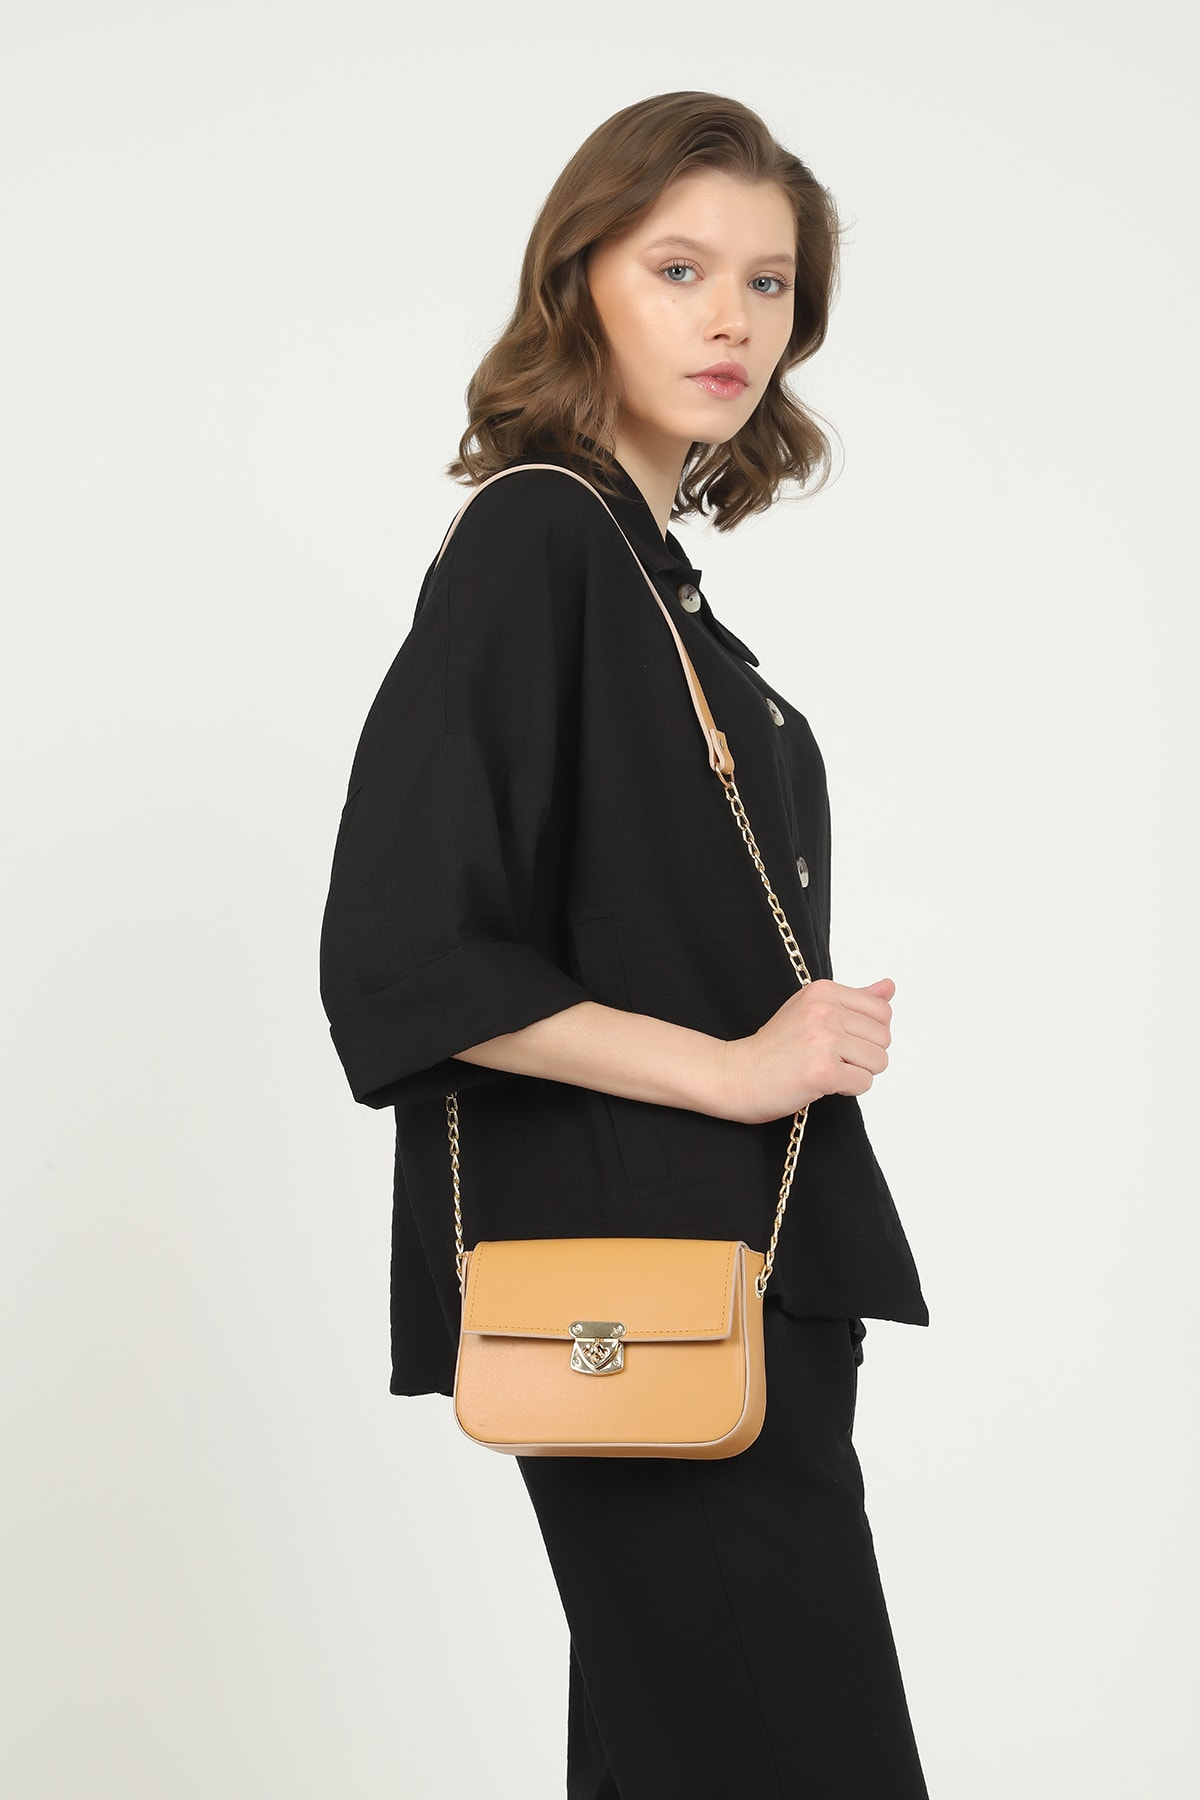 QOOL WOMEN Kadın Çanta Mini Baget 2